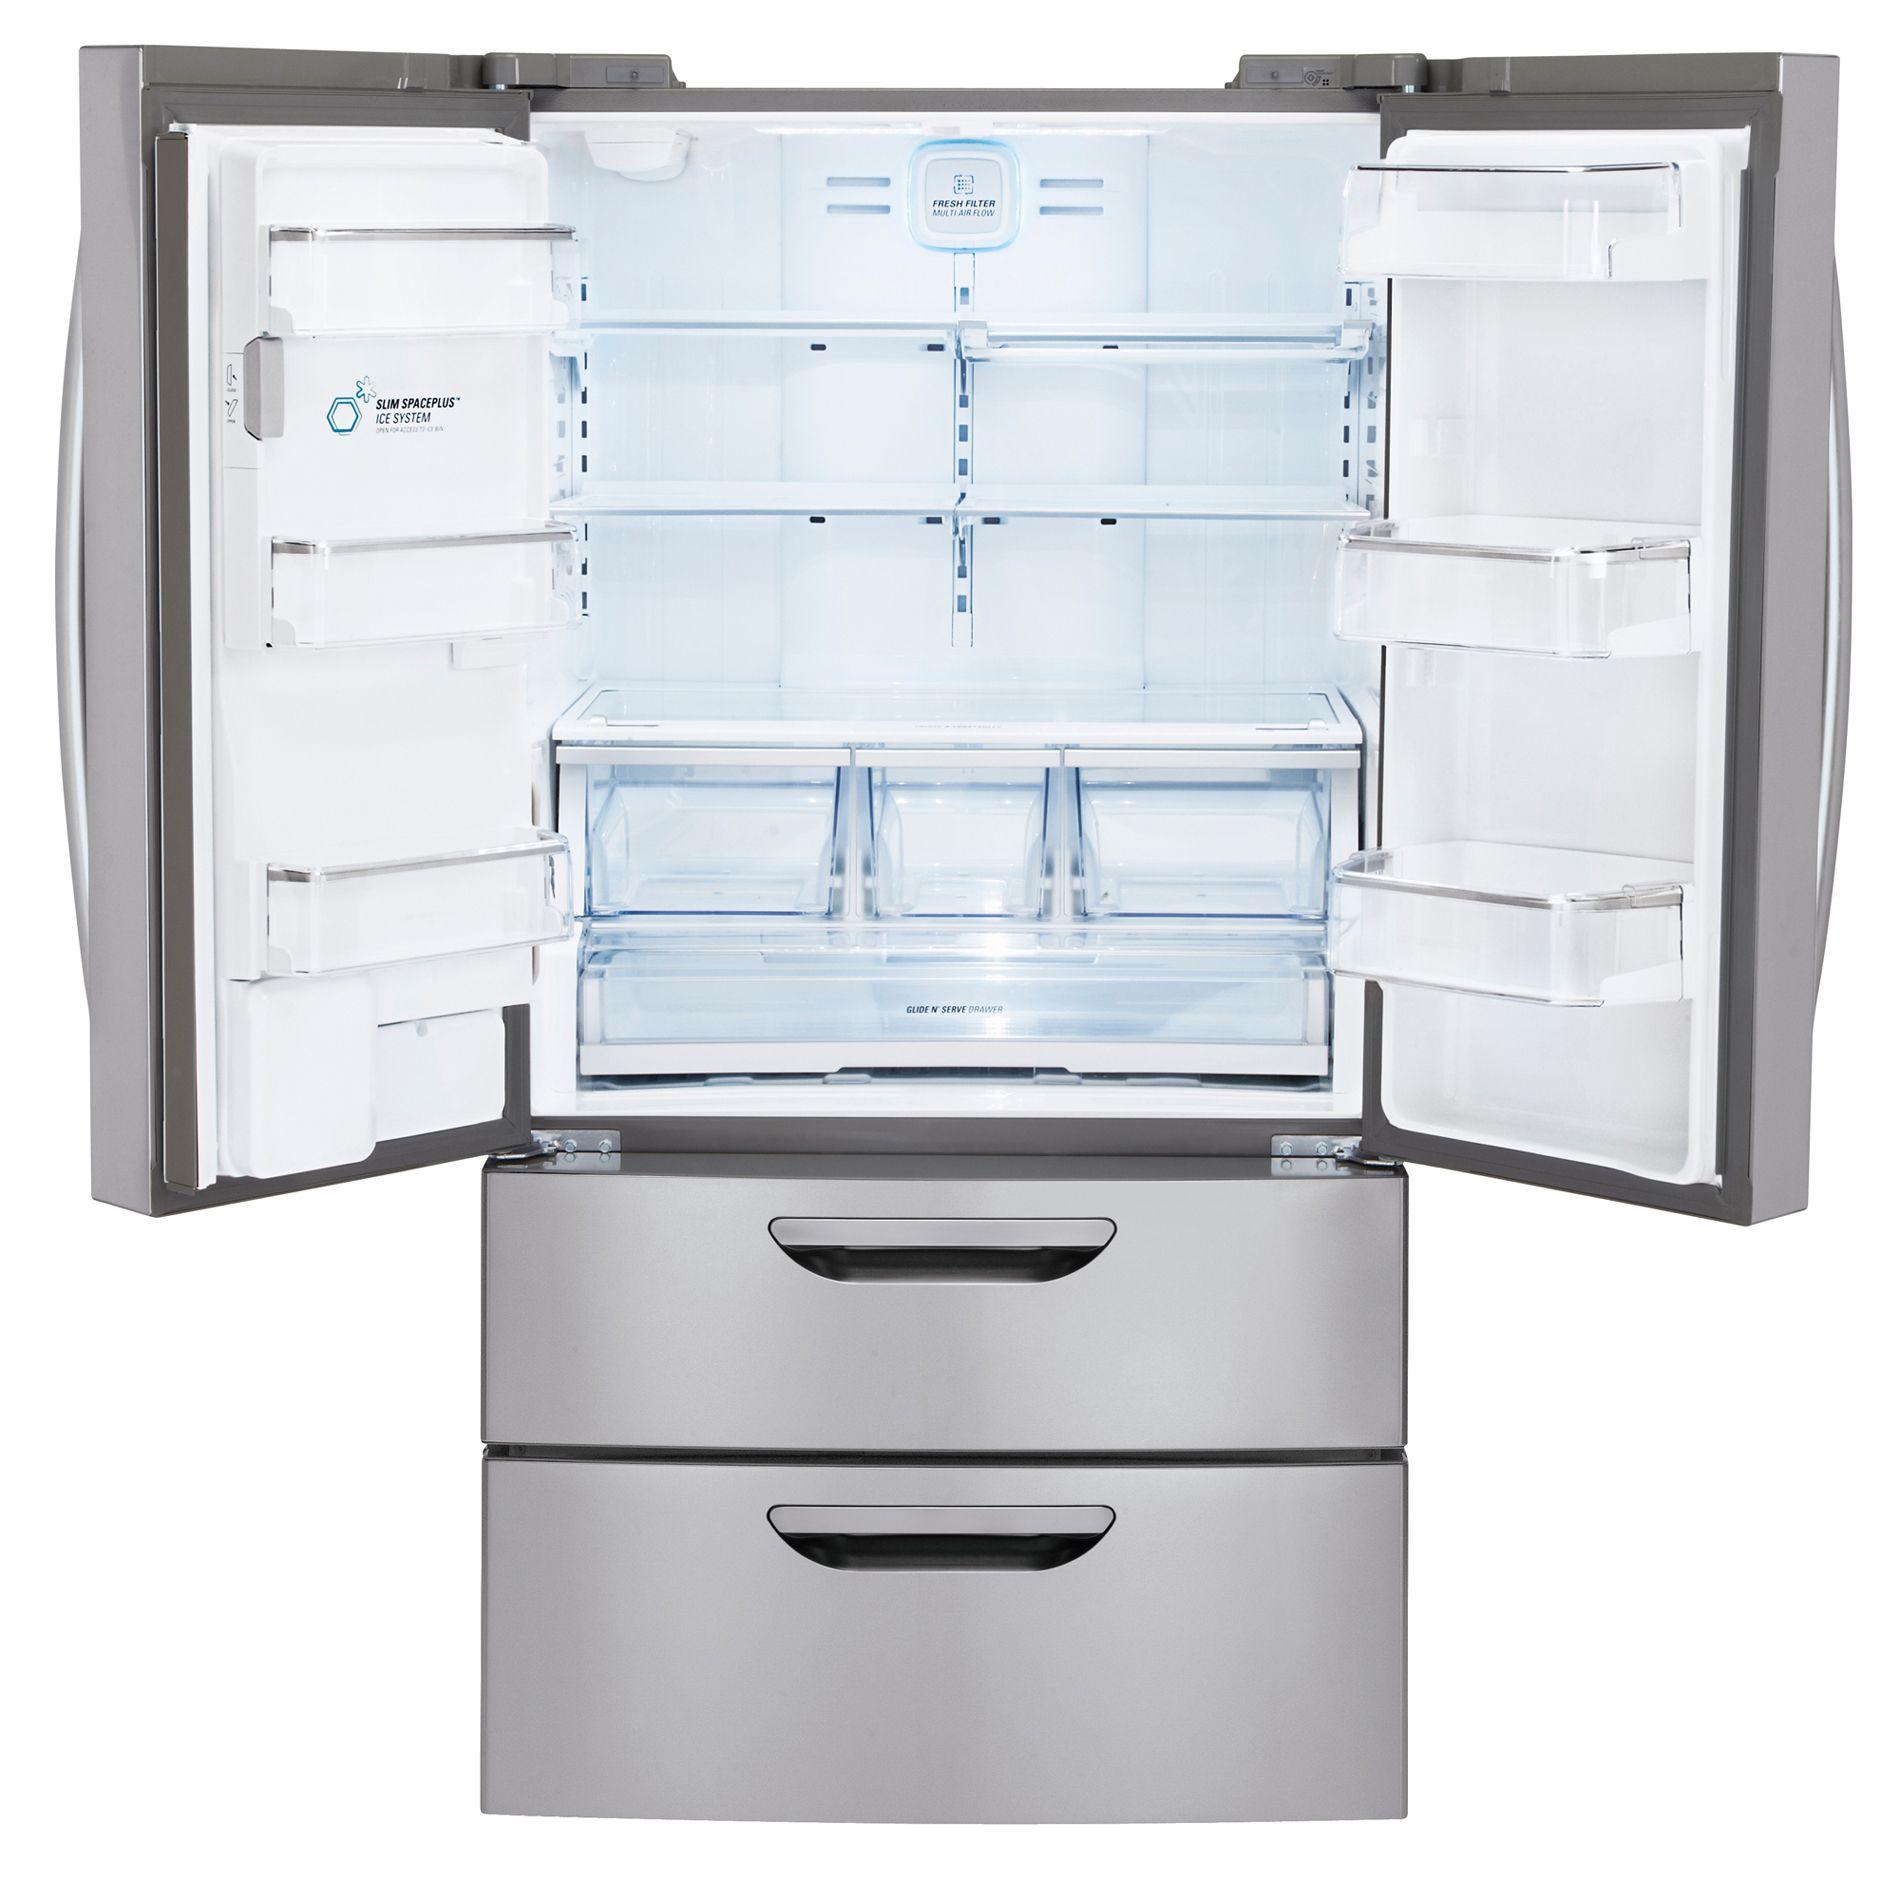 LG 31 cu. ft.  French Door Bottom-Freezer Refrigerator w Dual-Freezer-Drawer - Stainless Steel